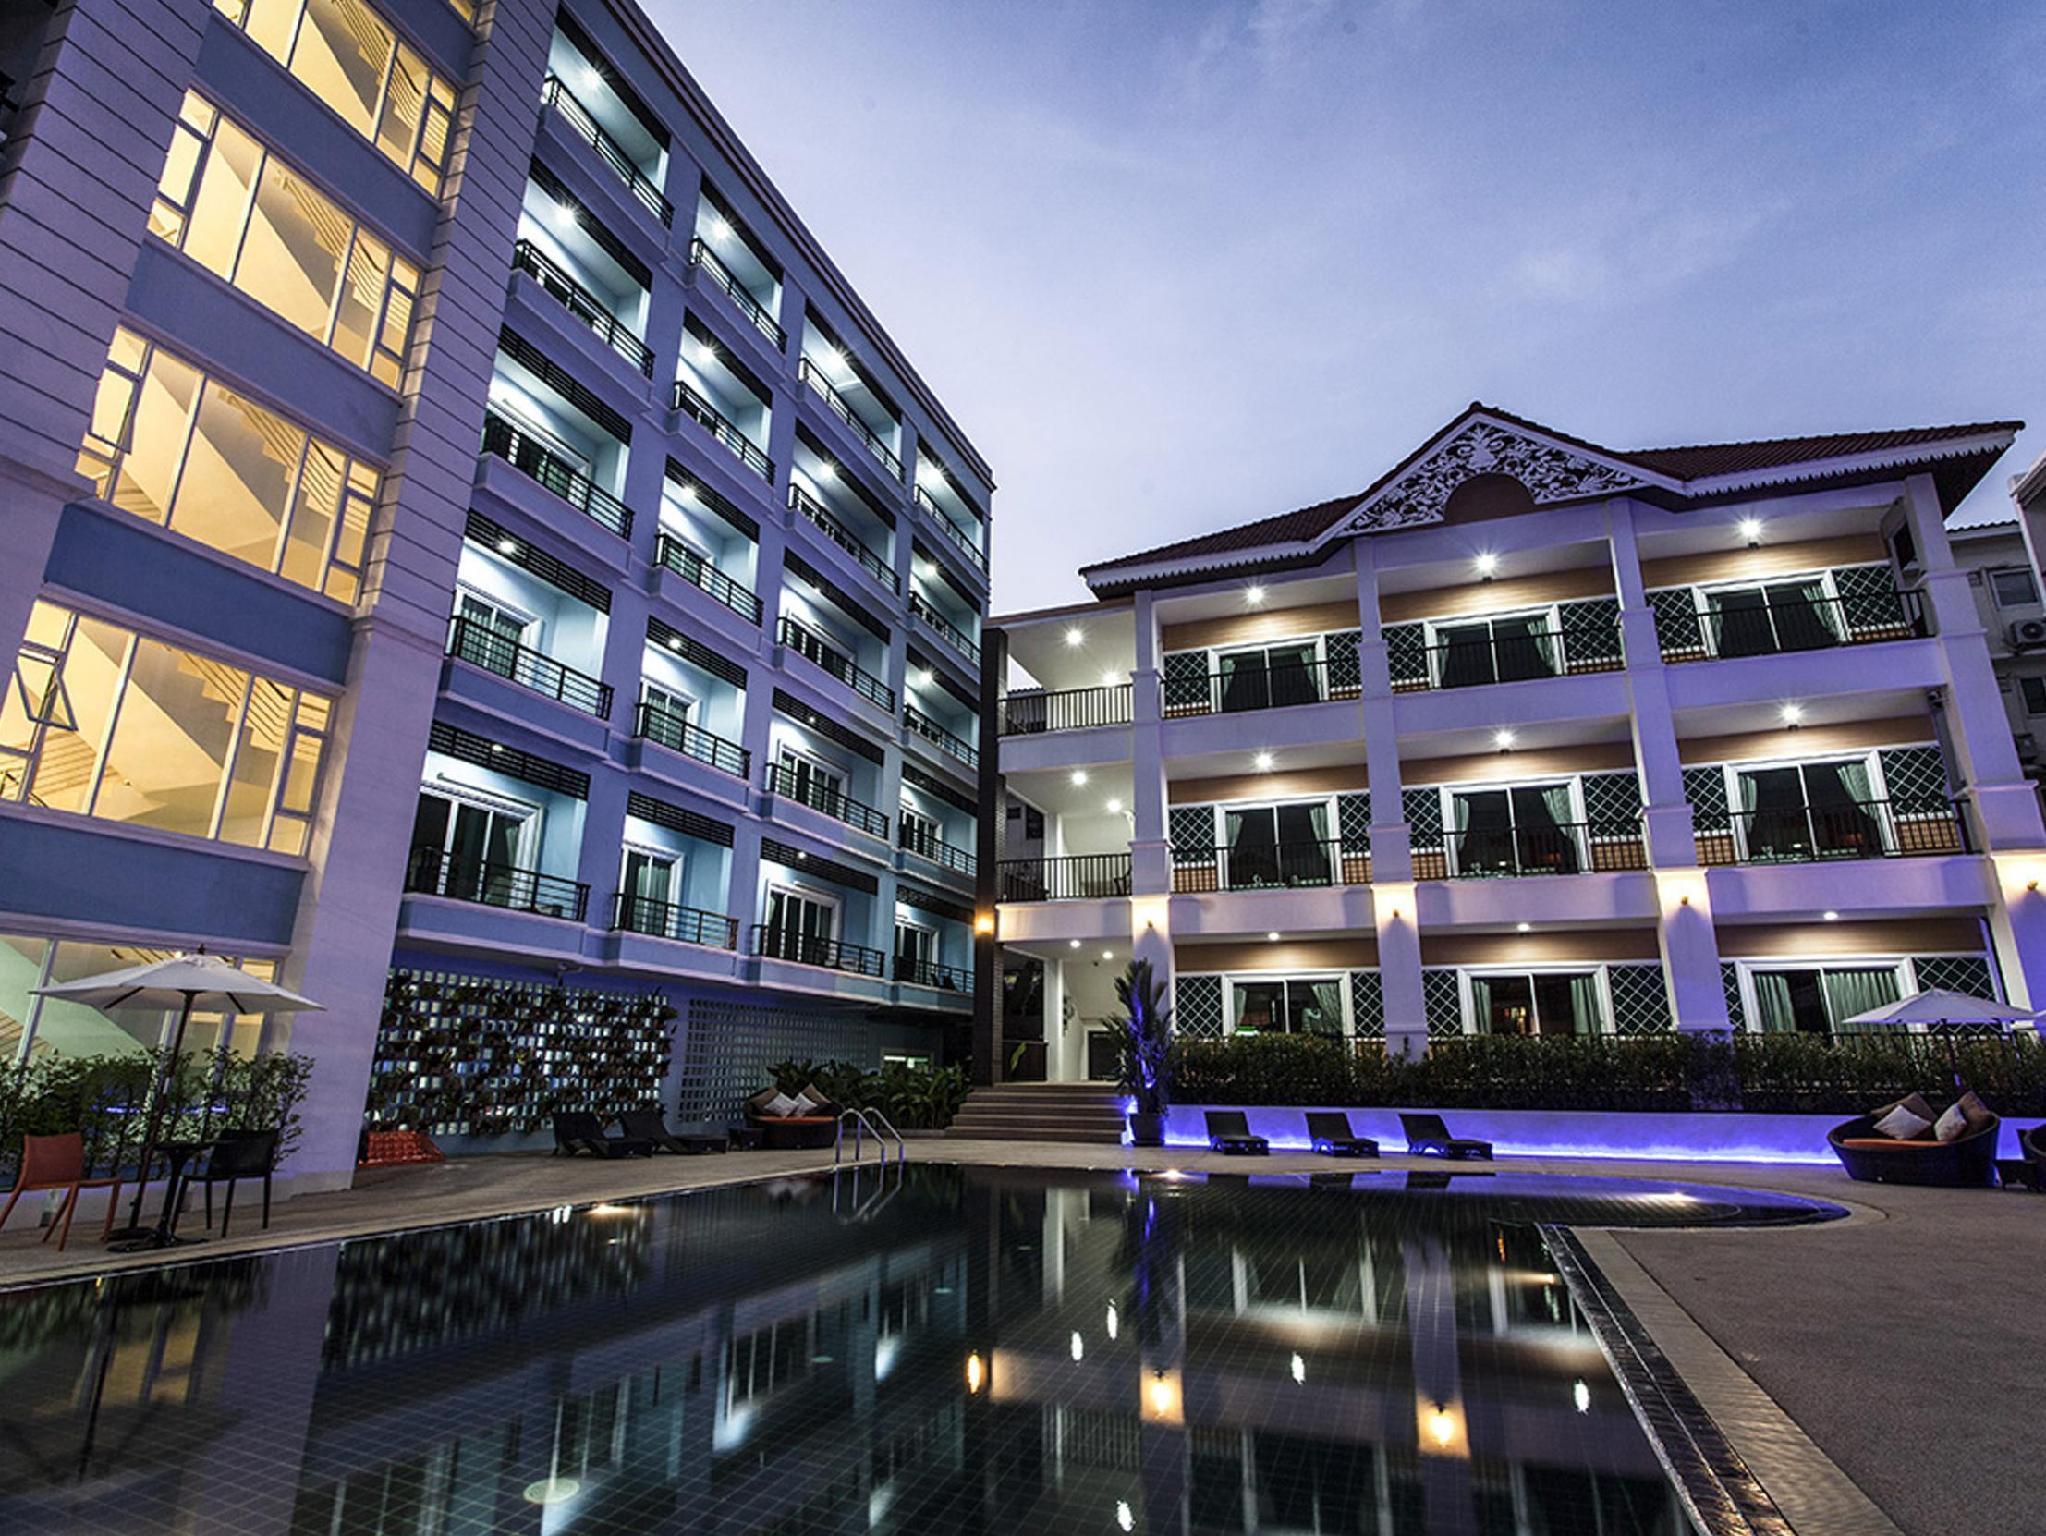 The Fourth Pattaya Hotel